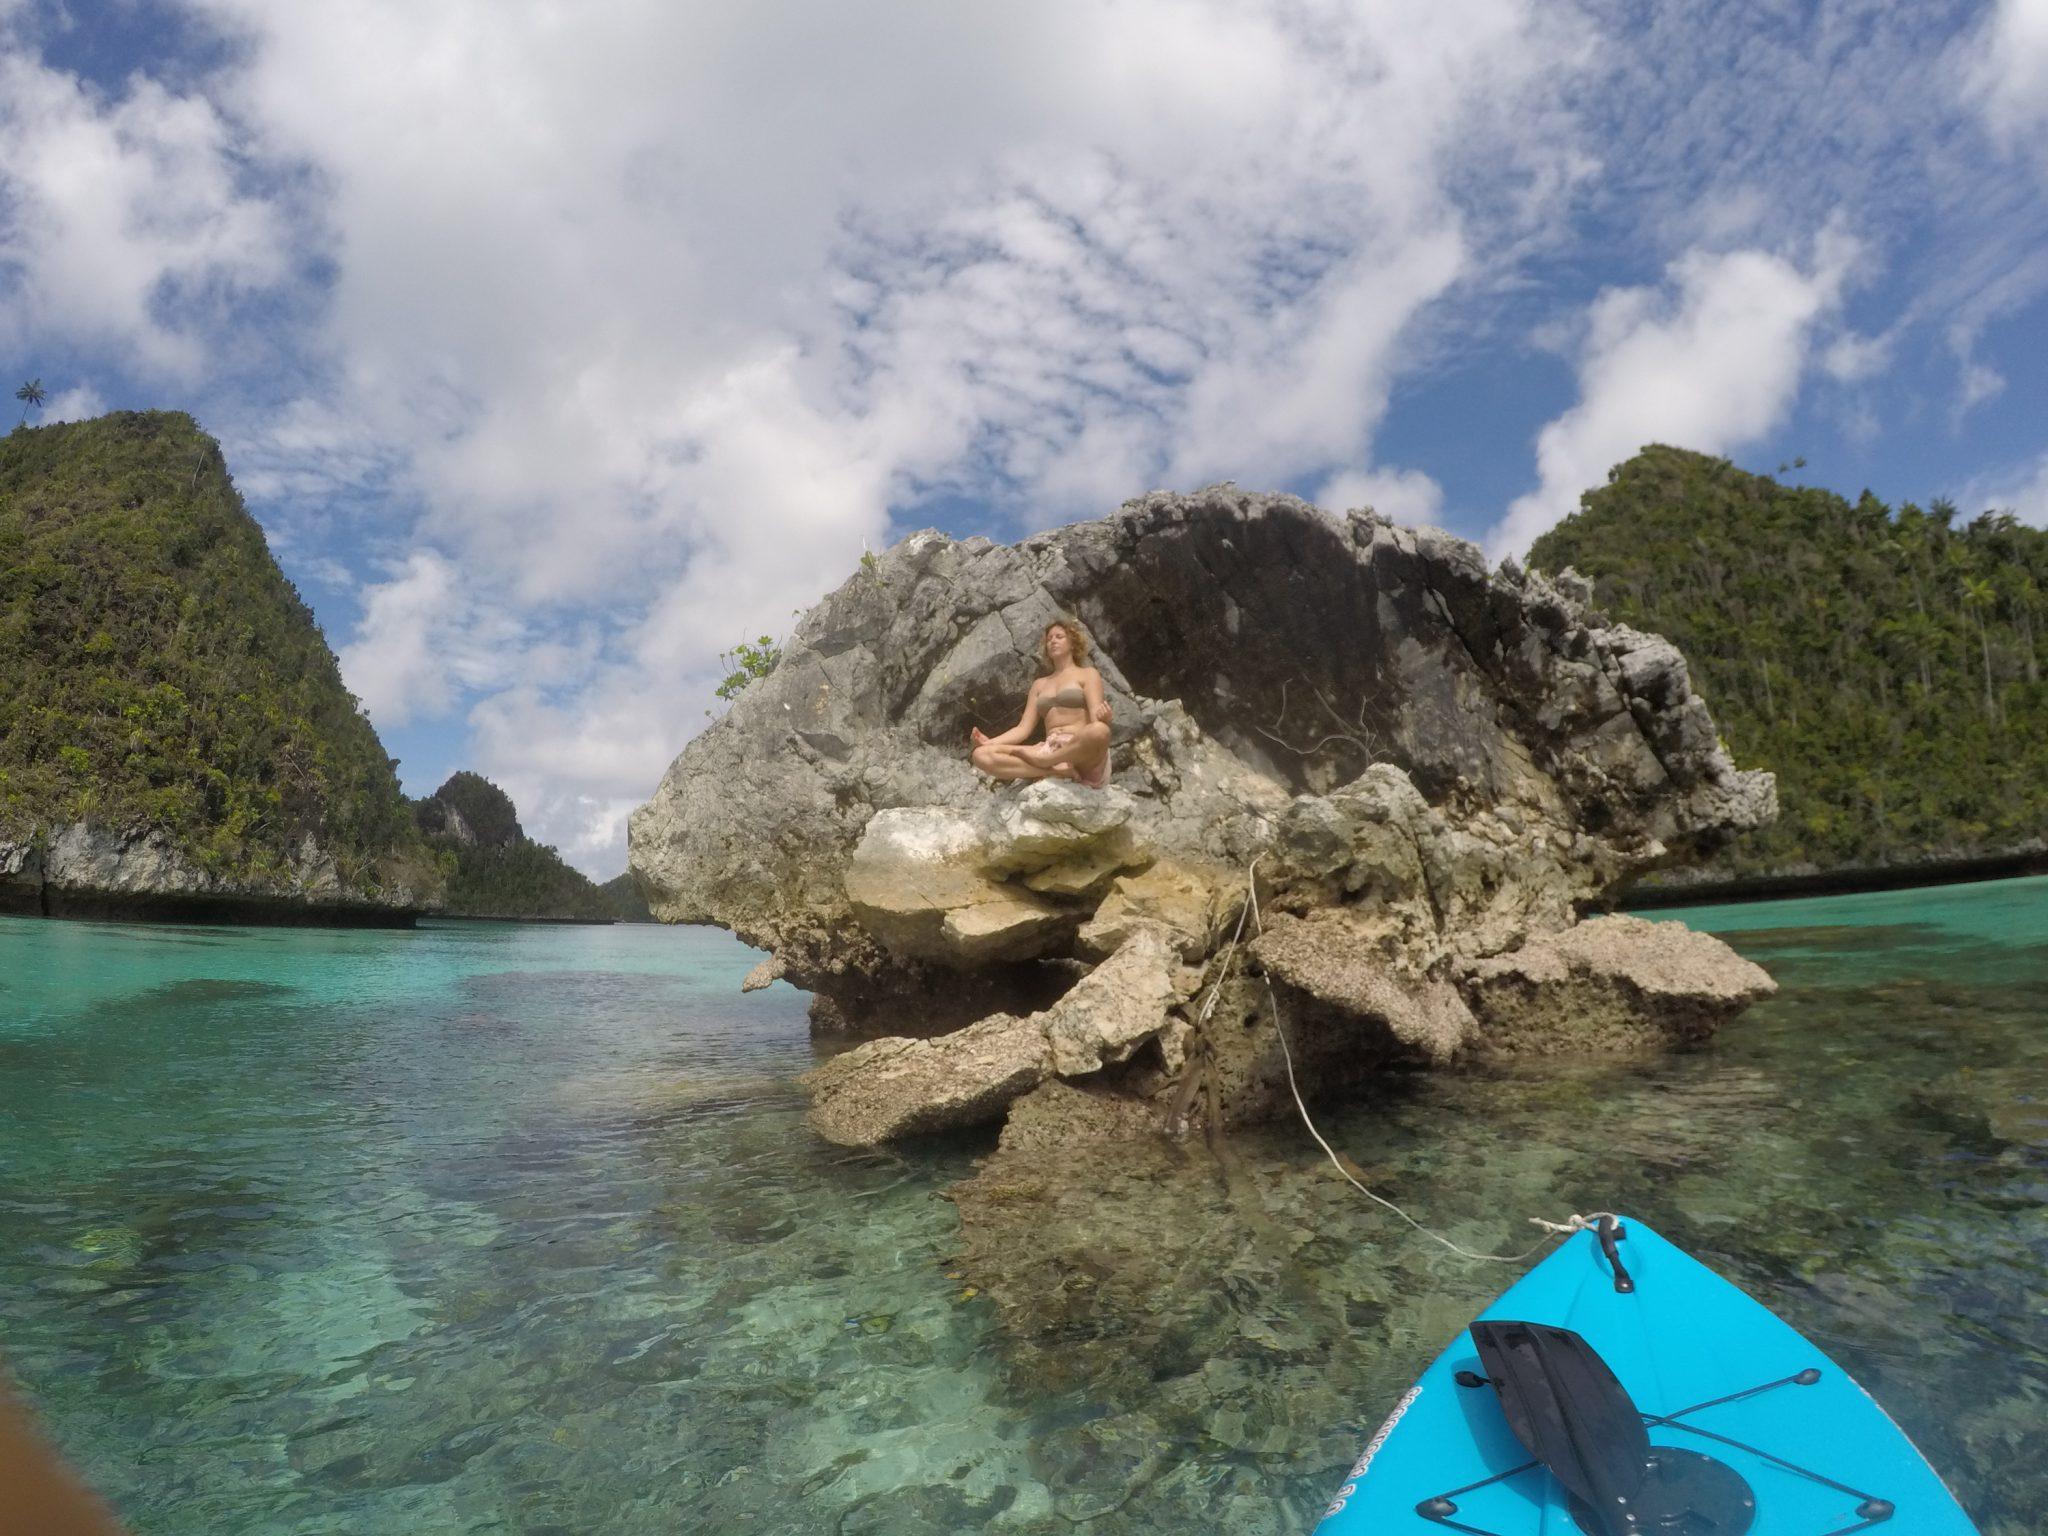 indonesiaaskjulie-slowretreats-rajaampat